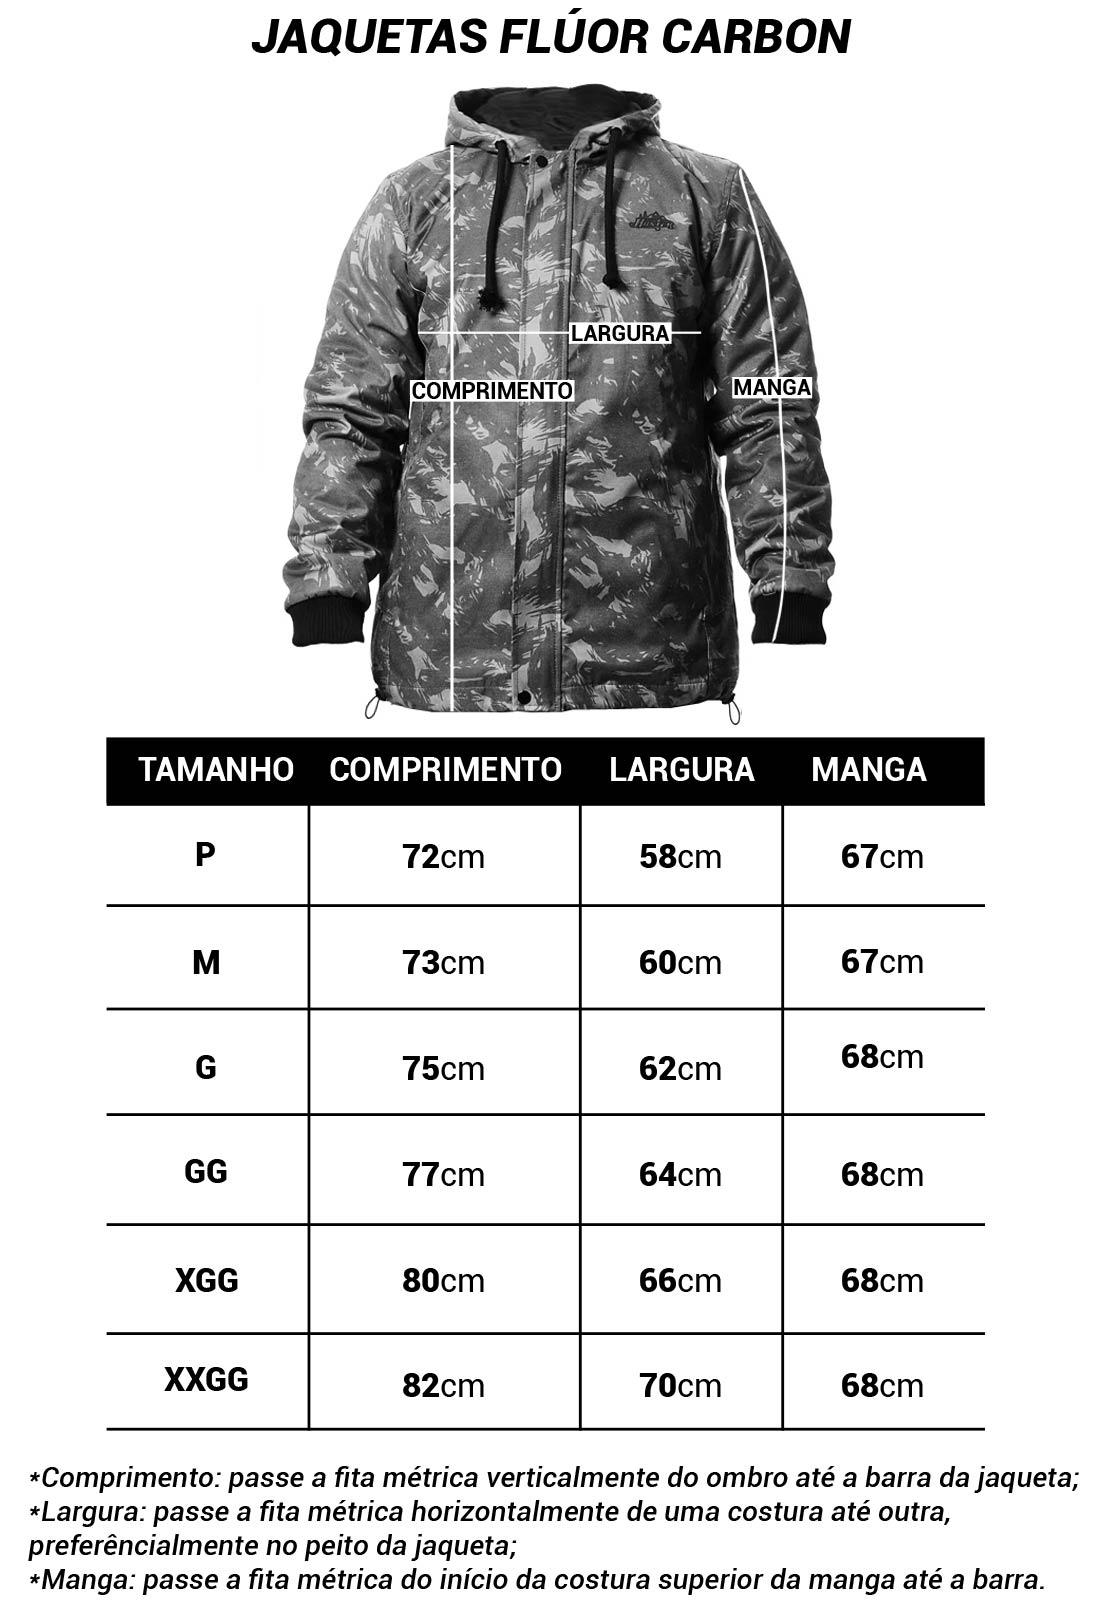 JAQUETA CAMUFLADA REALTREE FLÚOR CARBON MASCULINA  - REAL HUNTER OUTDOORS